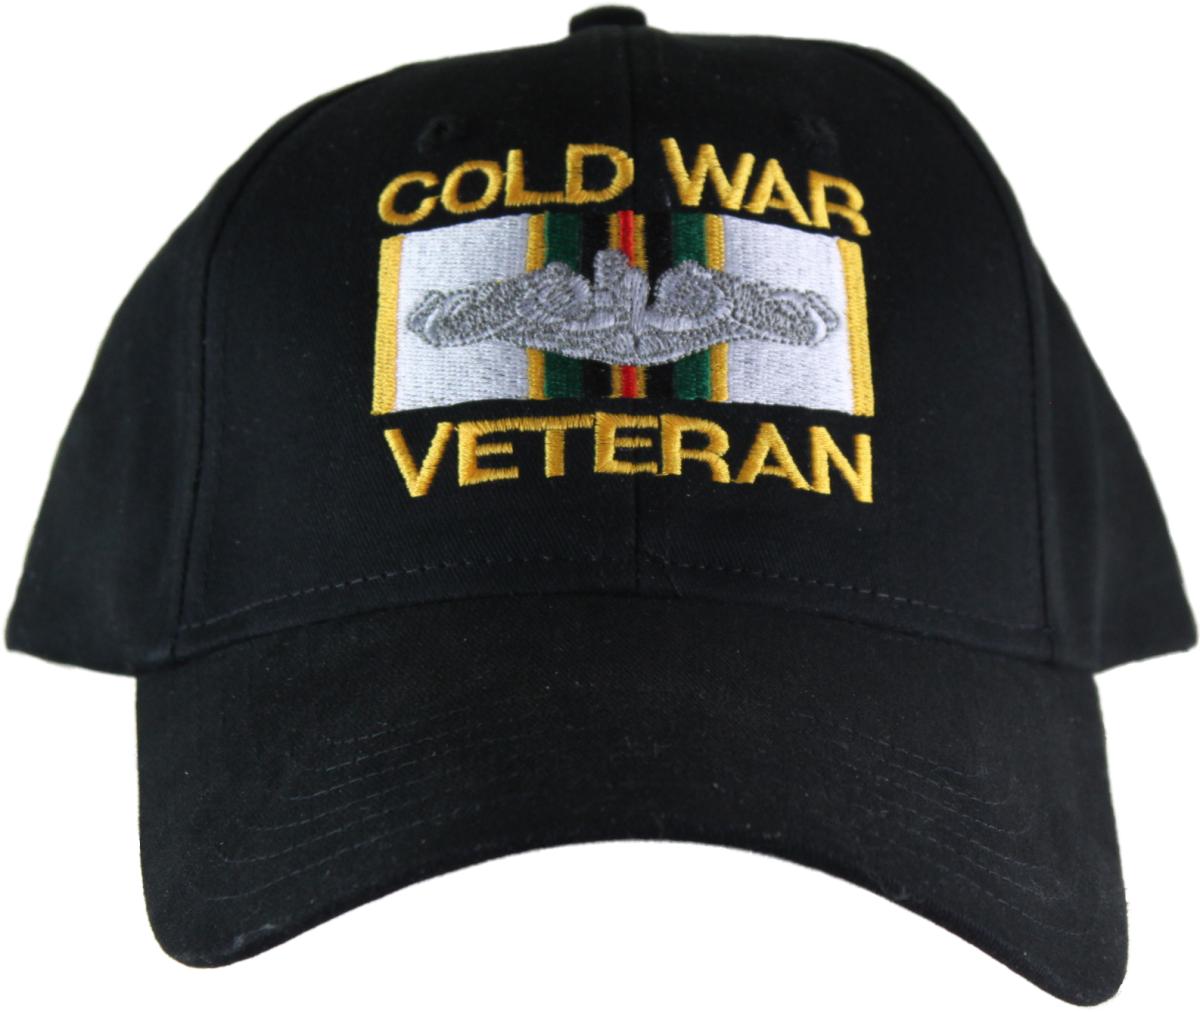 Cold War Veteran Cap - Submarine Ship's Store